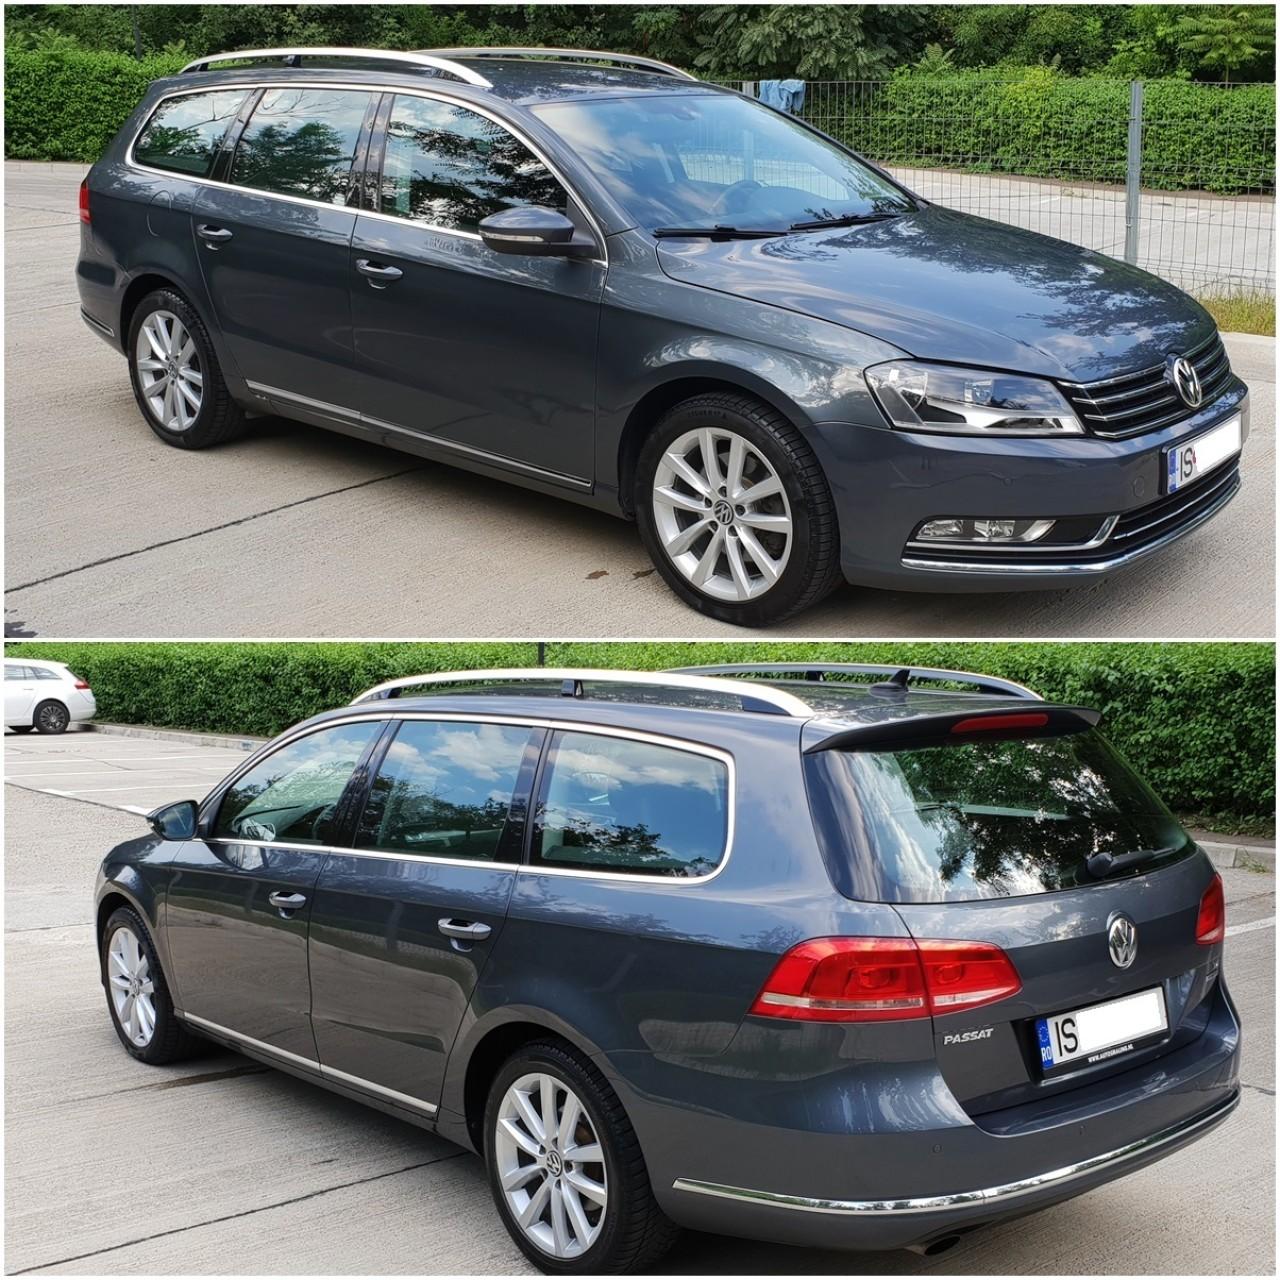 VW Passat 1.6 Bluemotions 2011